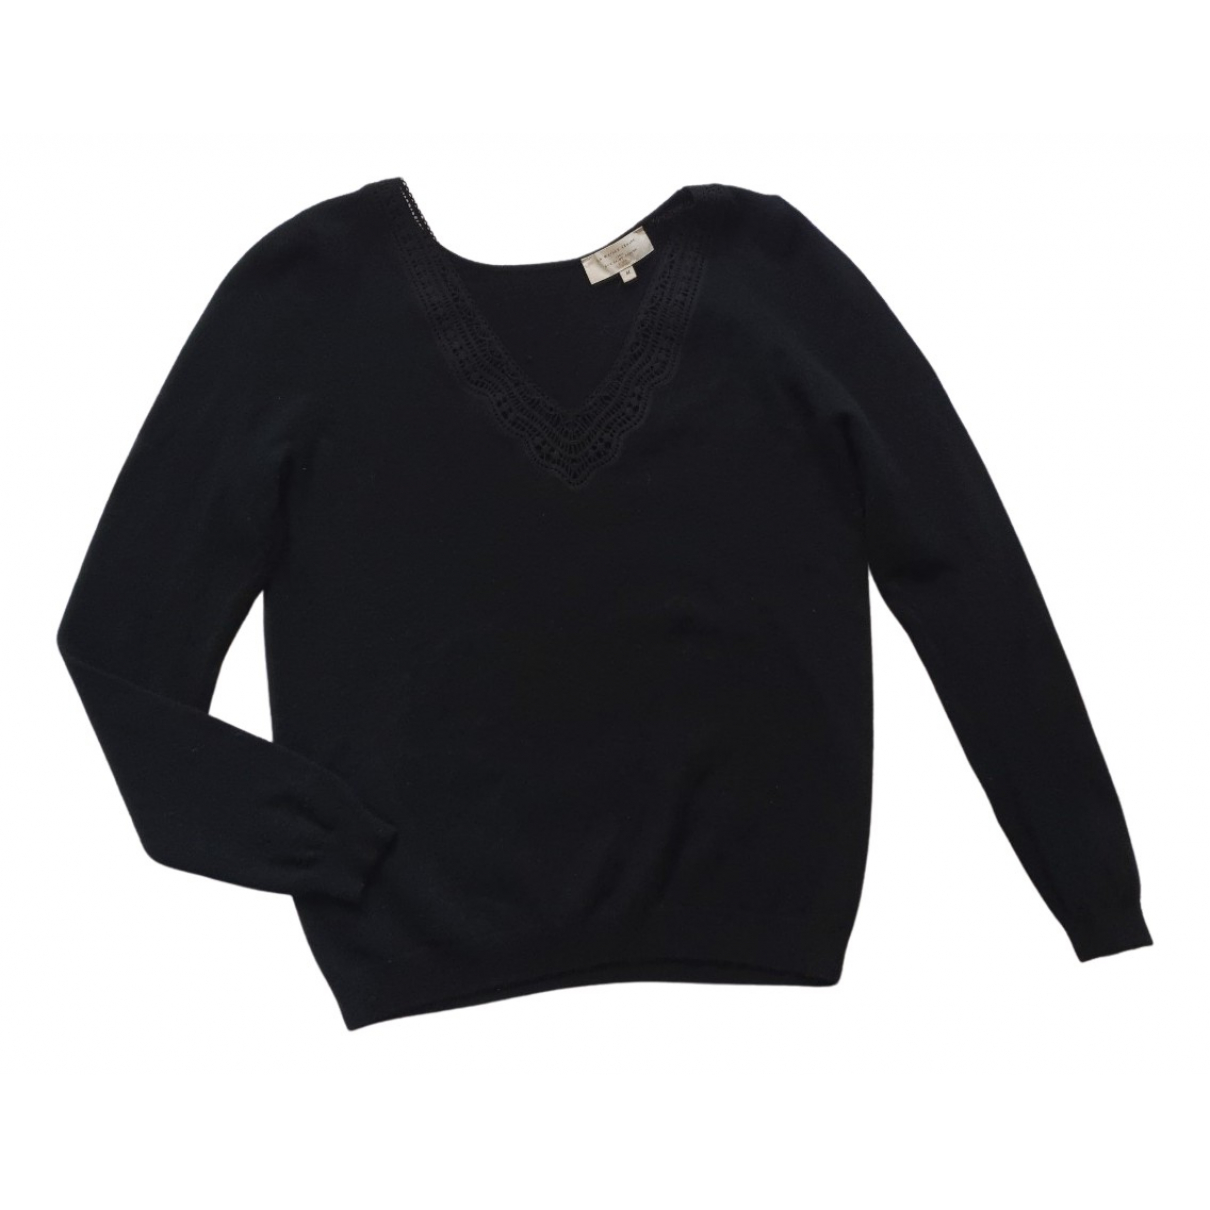 Sezane - Pull Fall Winter 2019 pour femme en laine - noir